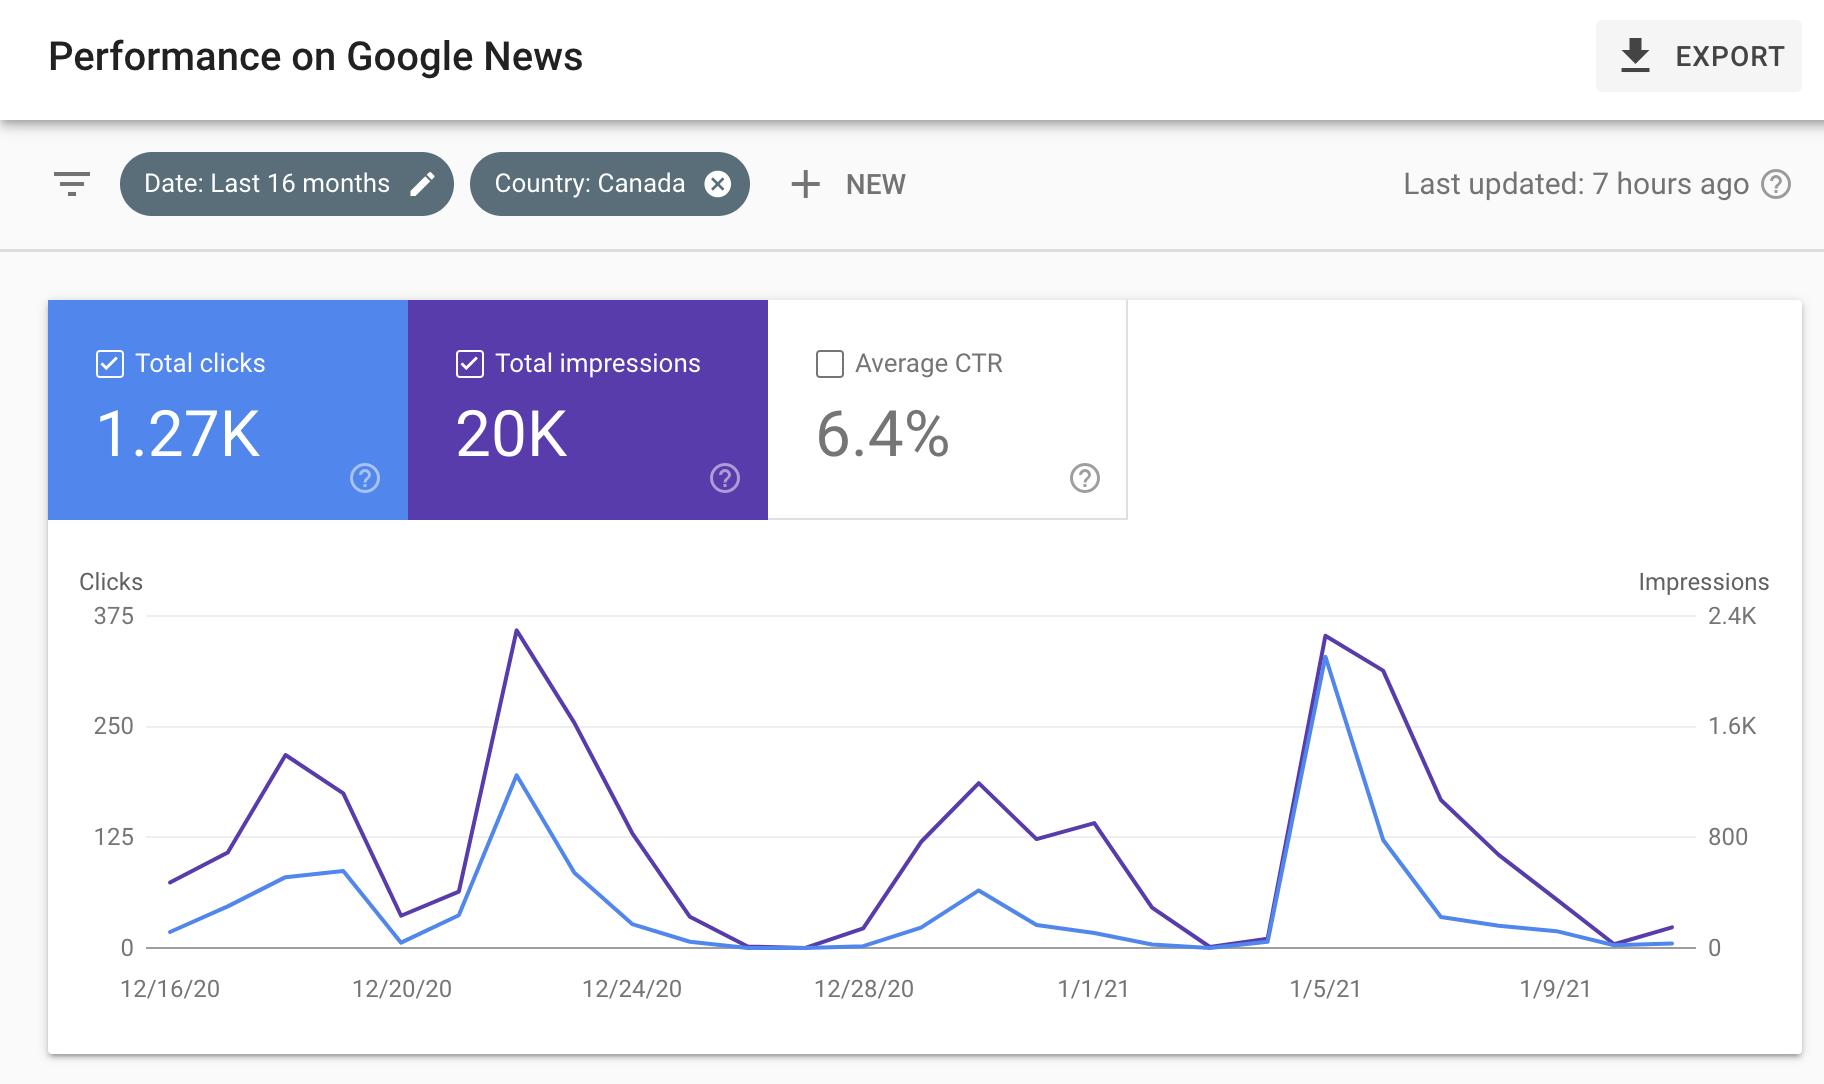 google-for-google-news-publishers-2的绩效报告Google推出Google News Publishers的绩效报告